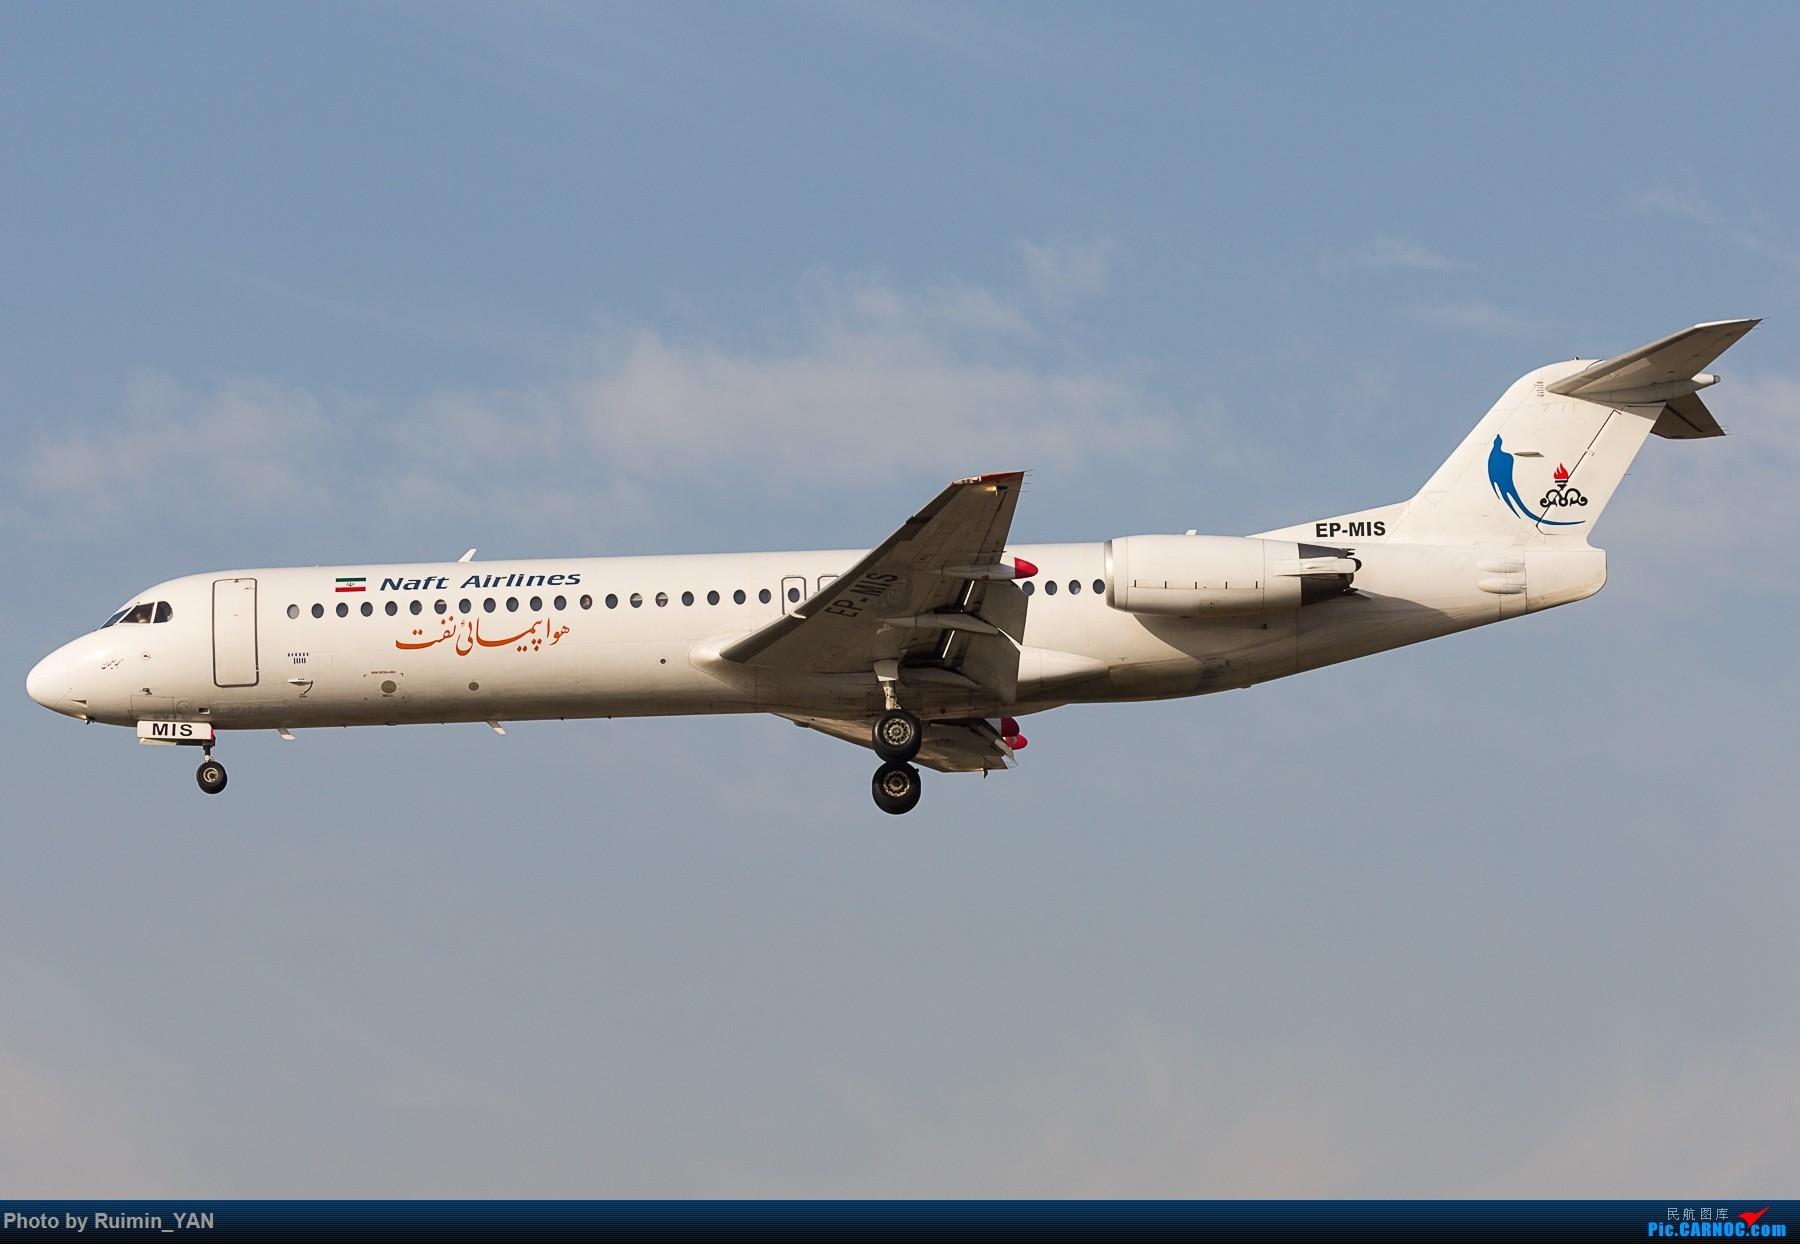 Re:[原创]【THR】(德黑兰梅赫拉巴德机场)伊朗Naft航空(Iranian Naft Airlines,IRG)--福克100 FOKKER 100 EP-MIS 伊朗德黑兰机场